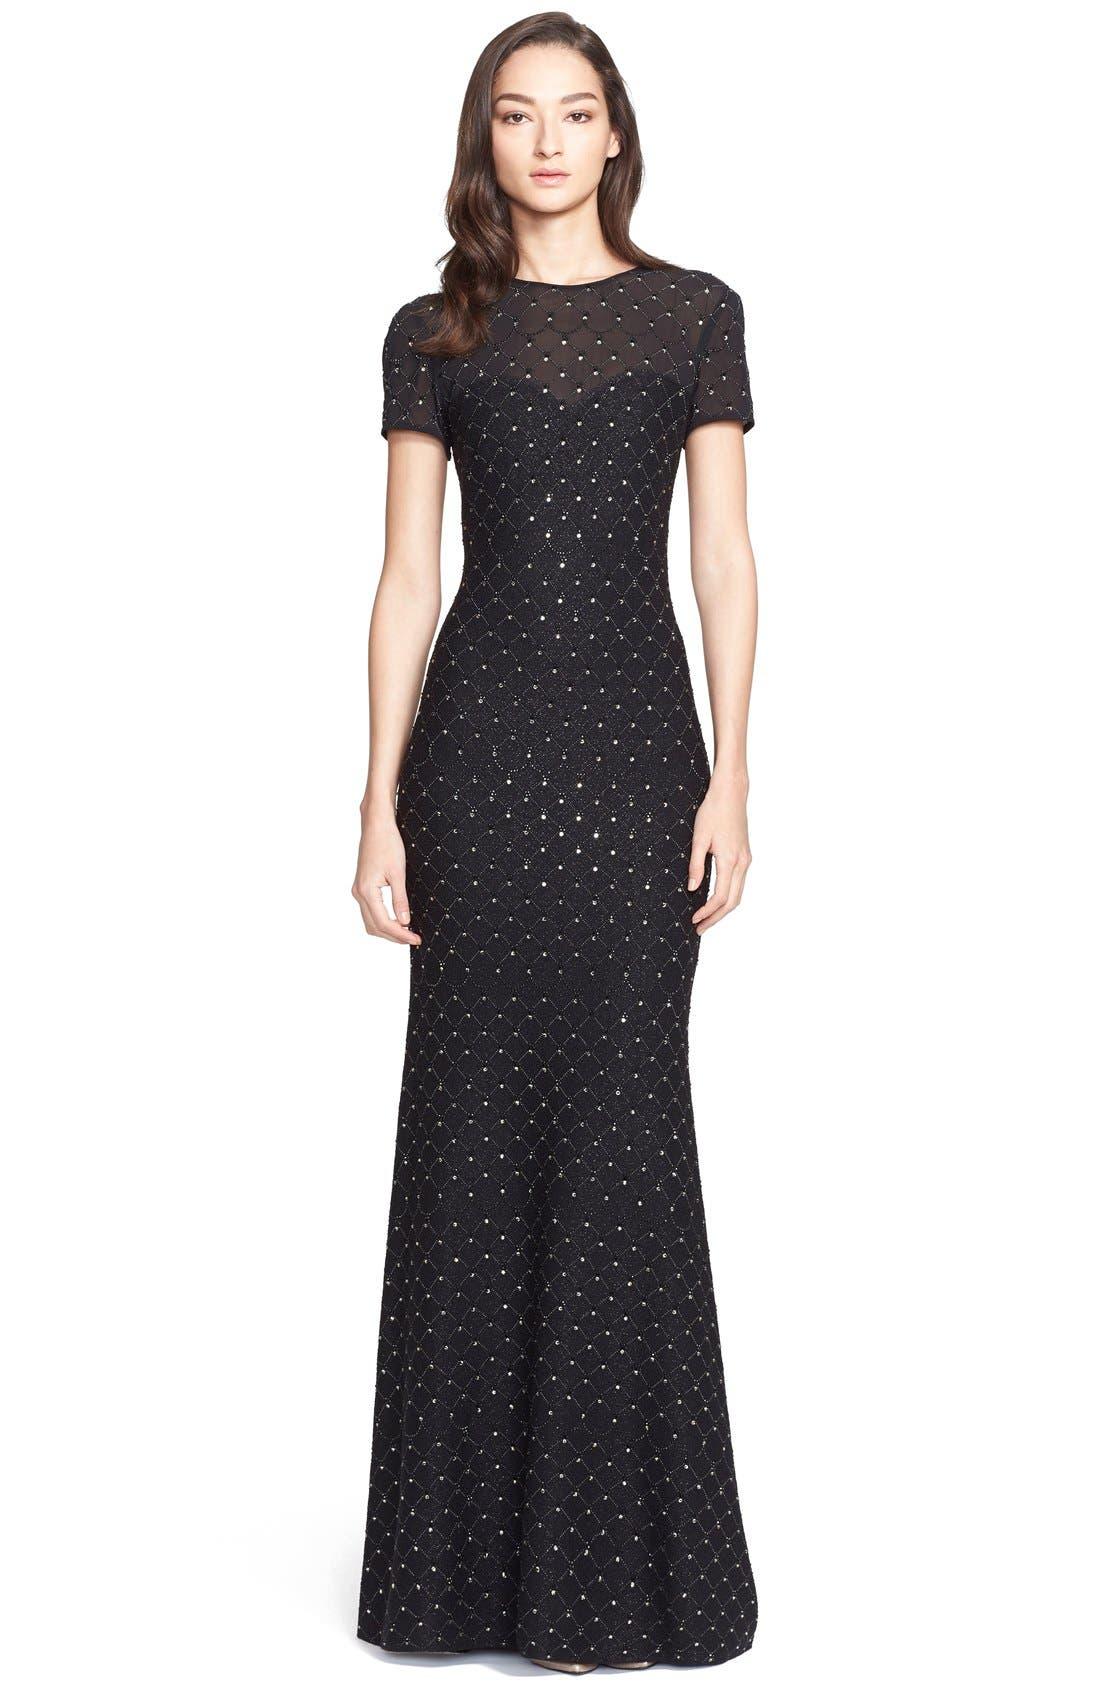 Alternate Image 1 Selected - St. John Collection Embellished Shimmer Knit Gown